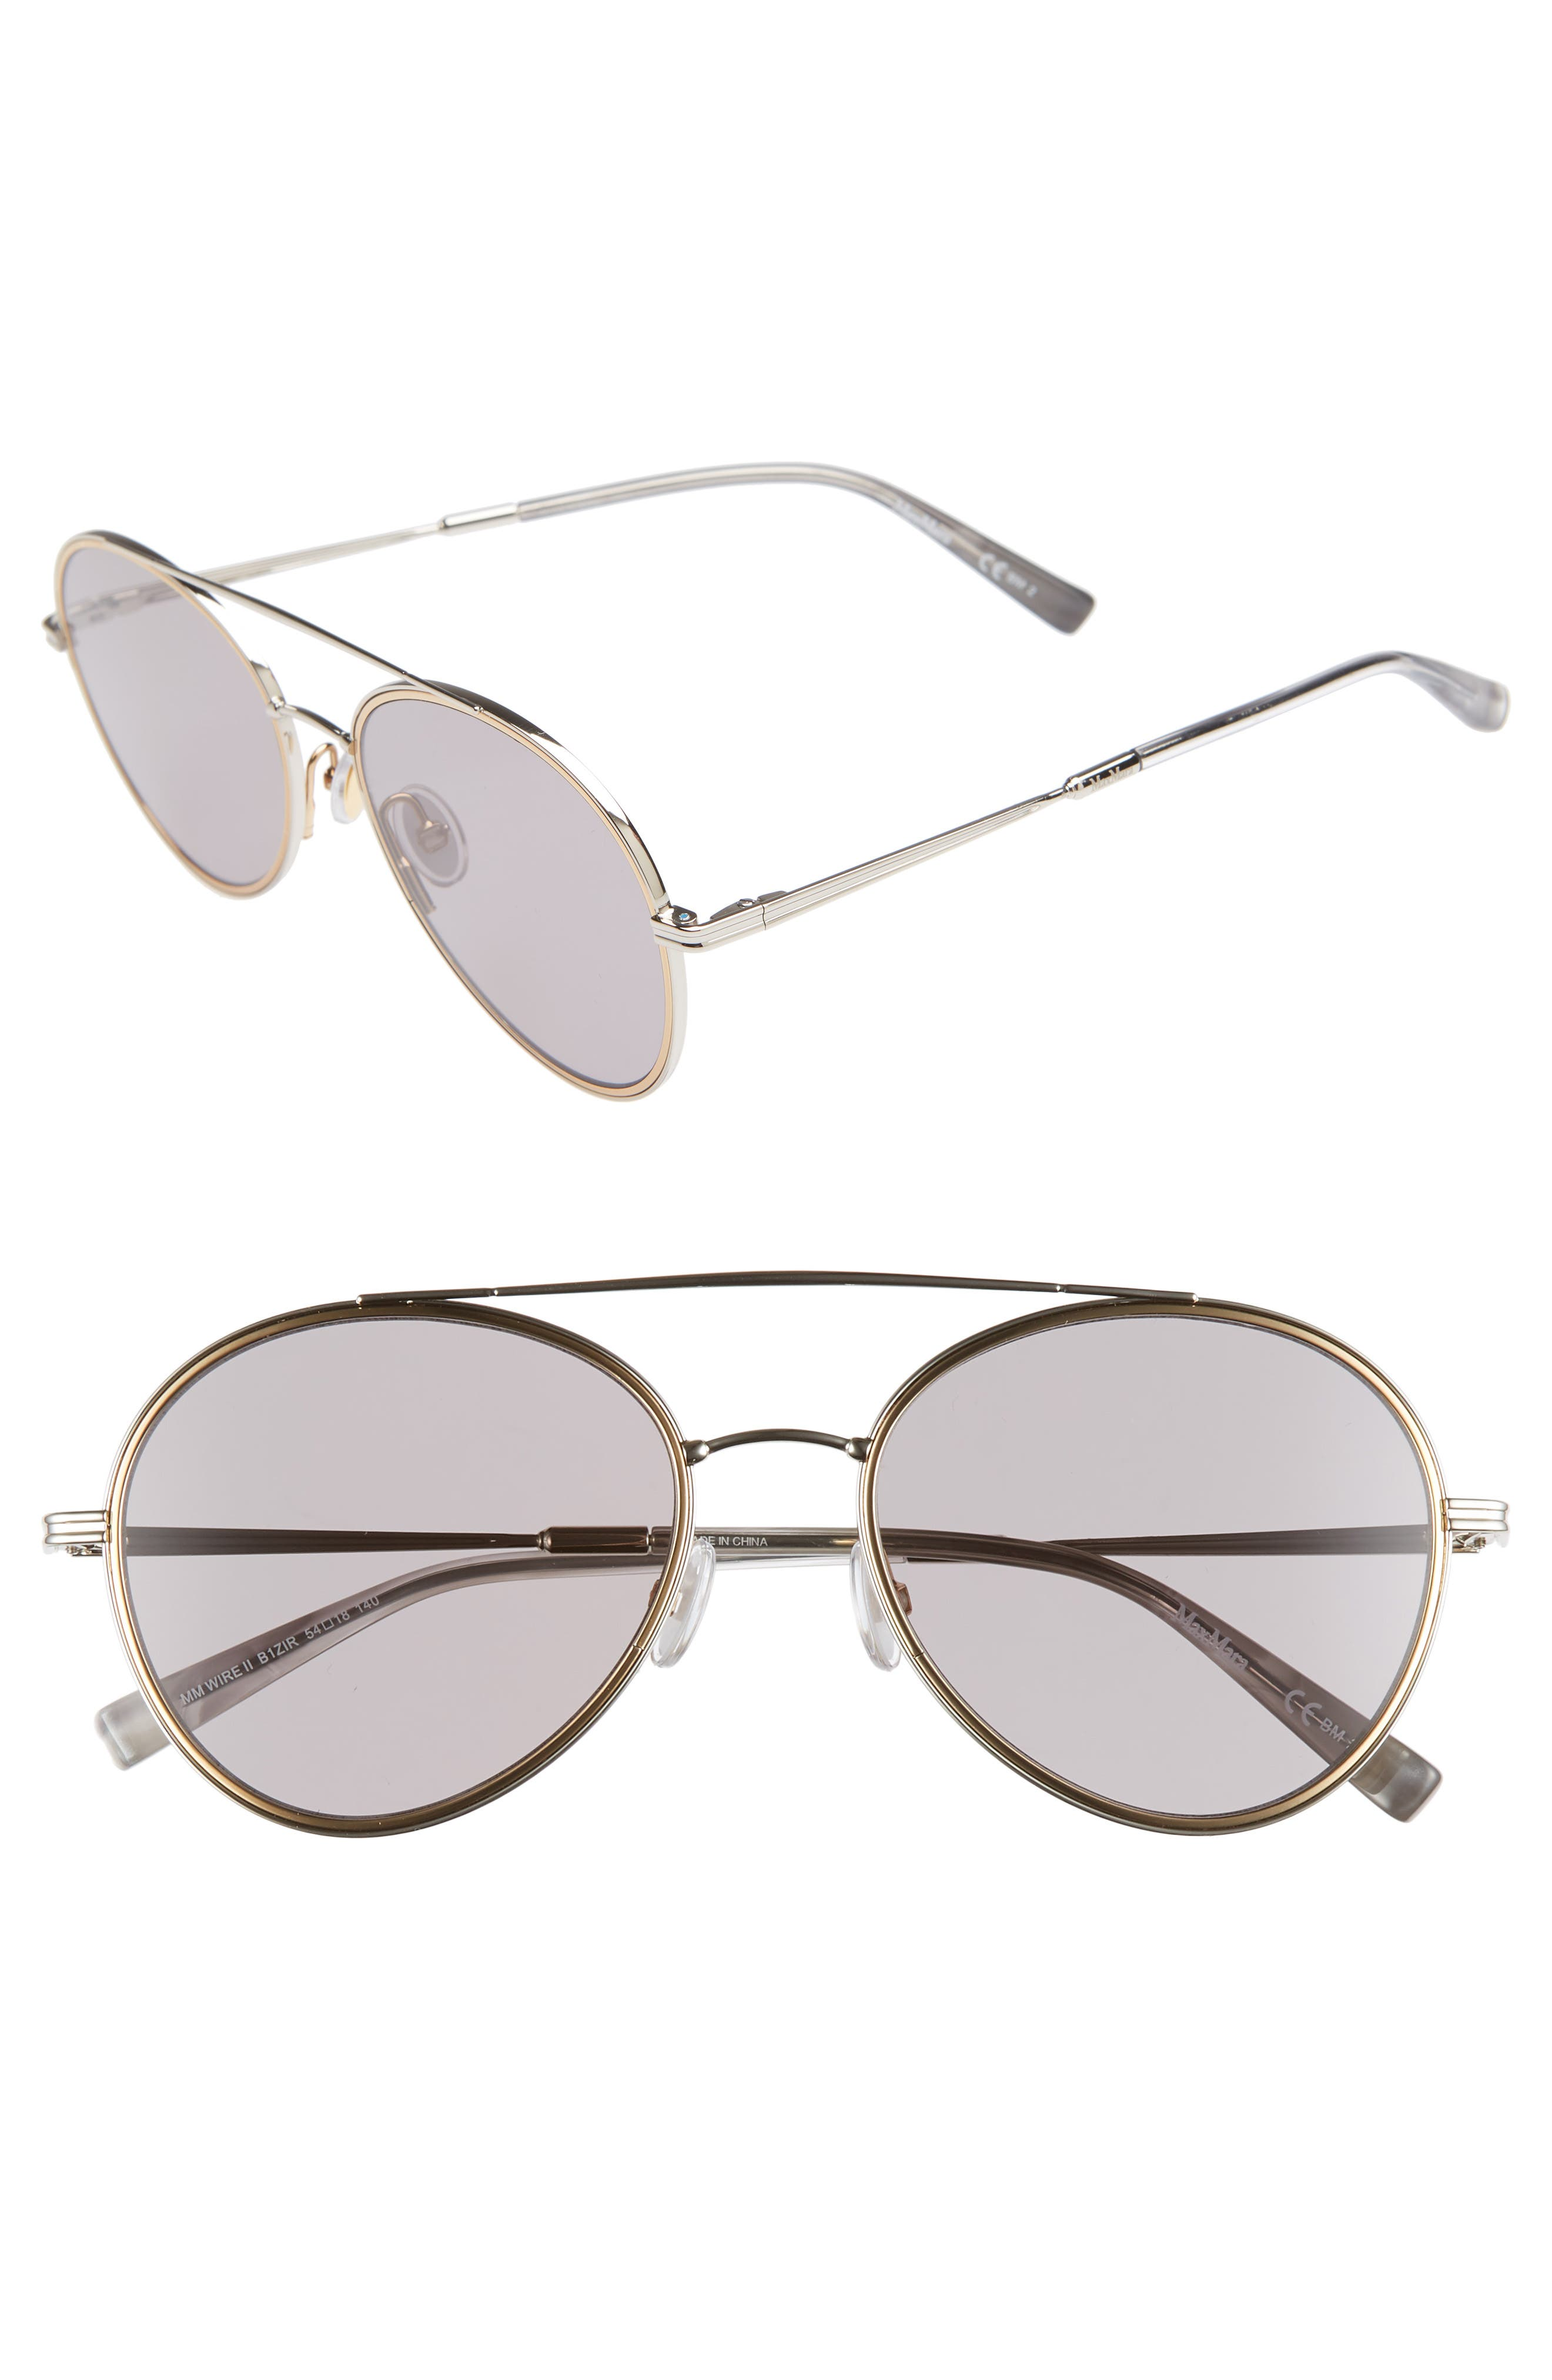 Wire II 54mm Aviator Sunglasses,                             Main thumbnail 1, color,                             SILVER